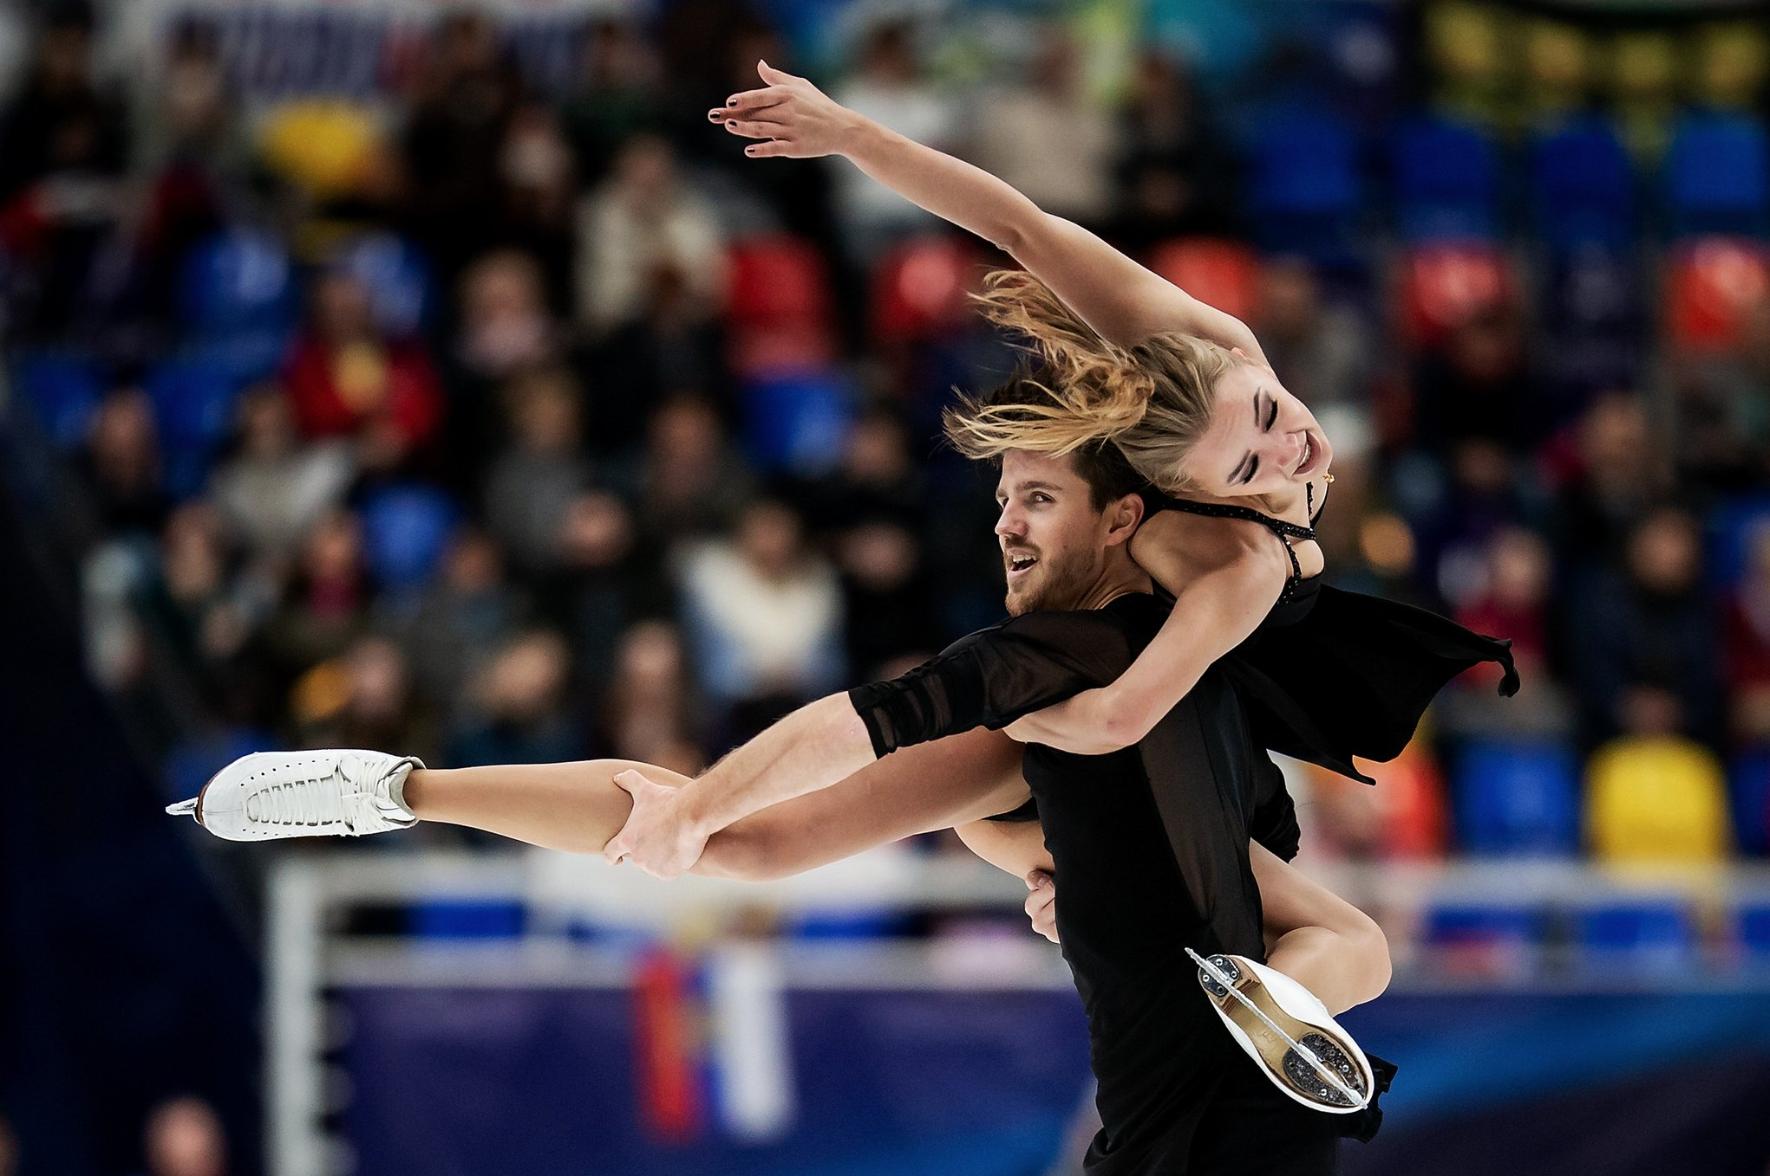 Alexandra Stepanova and Ivan Bukin (RUS) perform their Free Dance at Rostelecom Cup 2018 ( source )